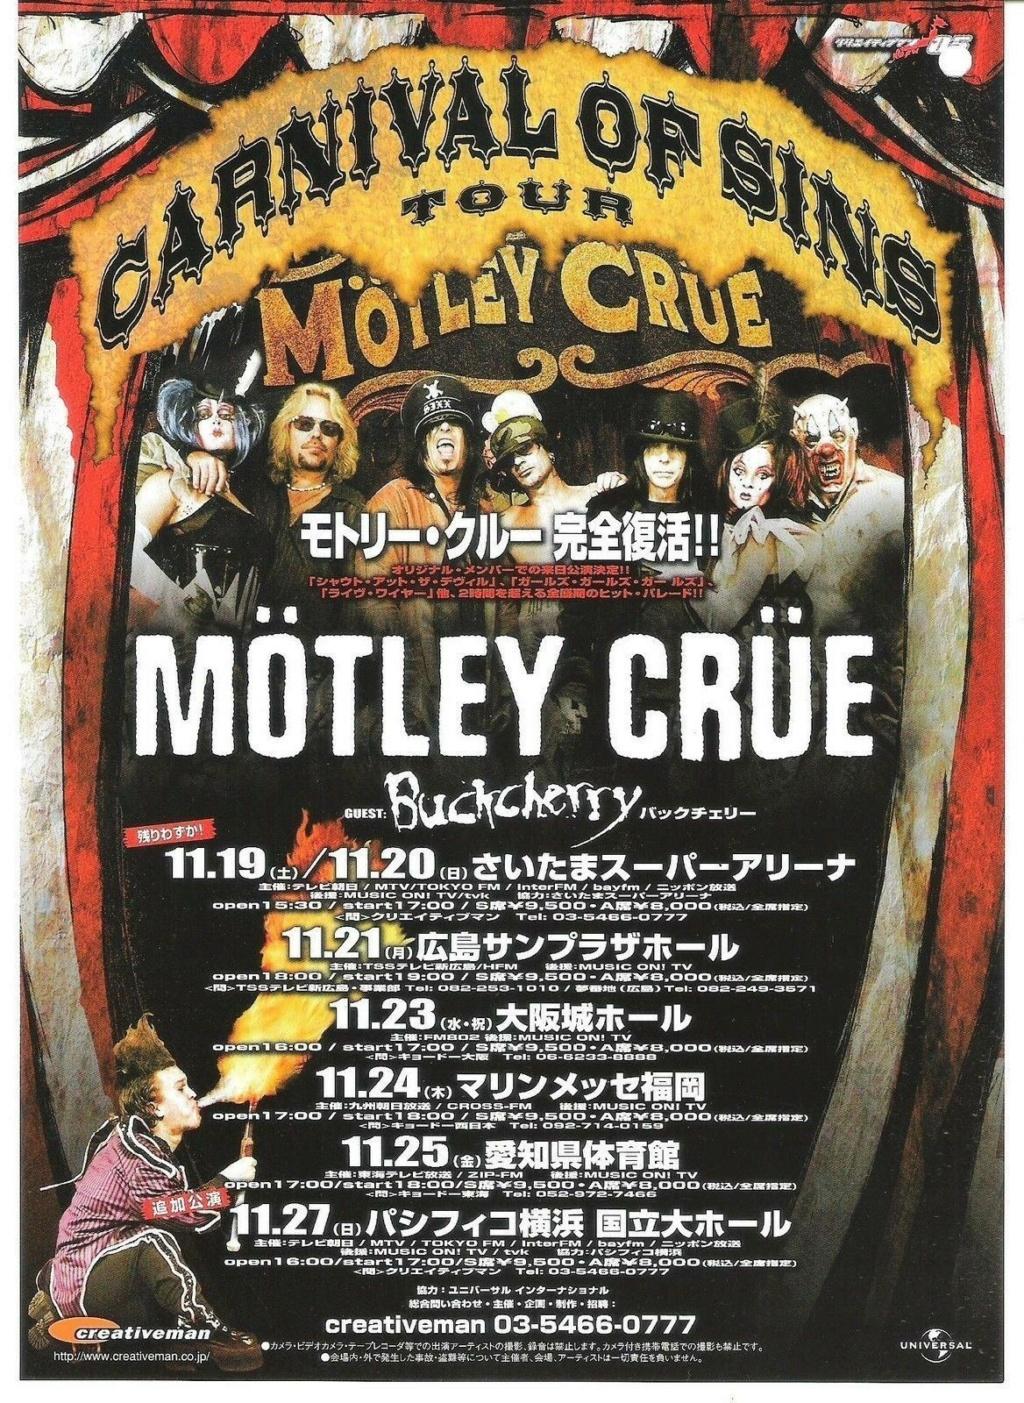 El final de Motley Crue??? Nooooo - Página 7 Japan11